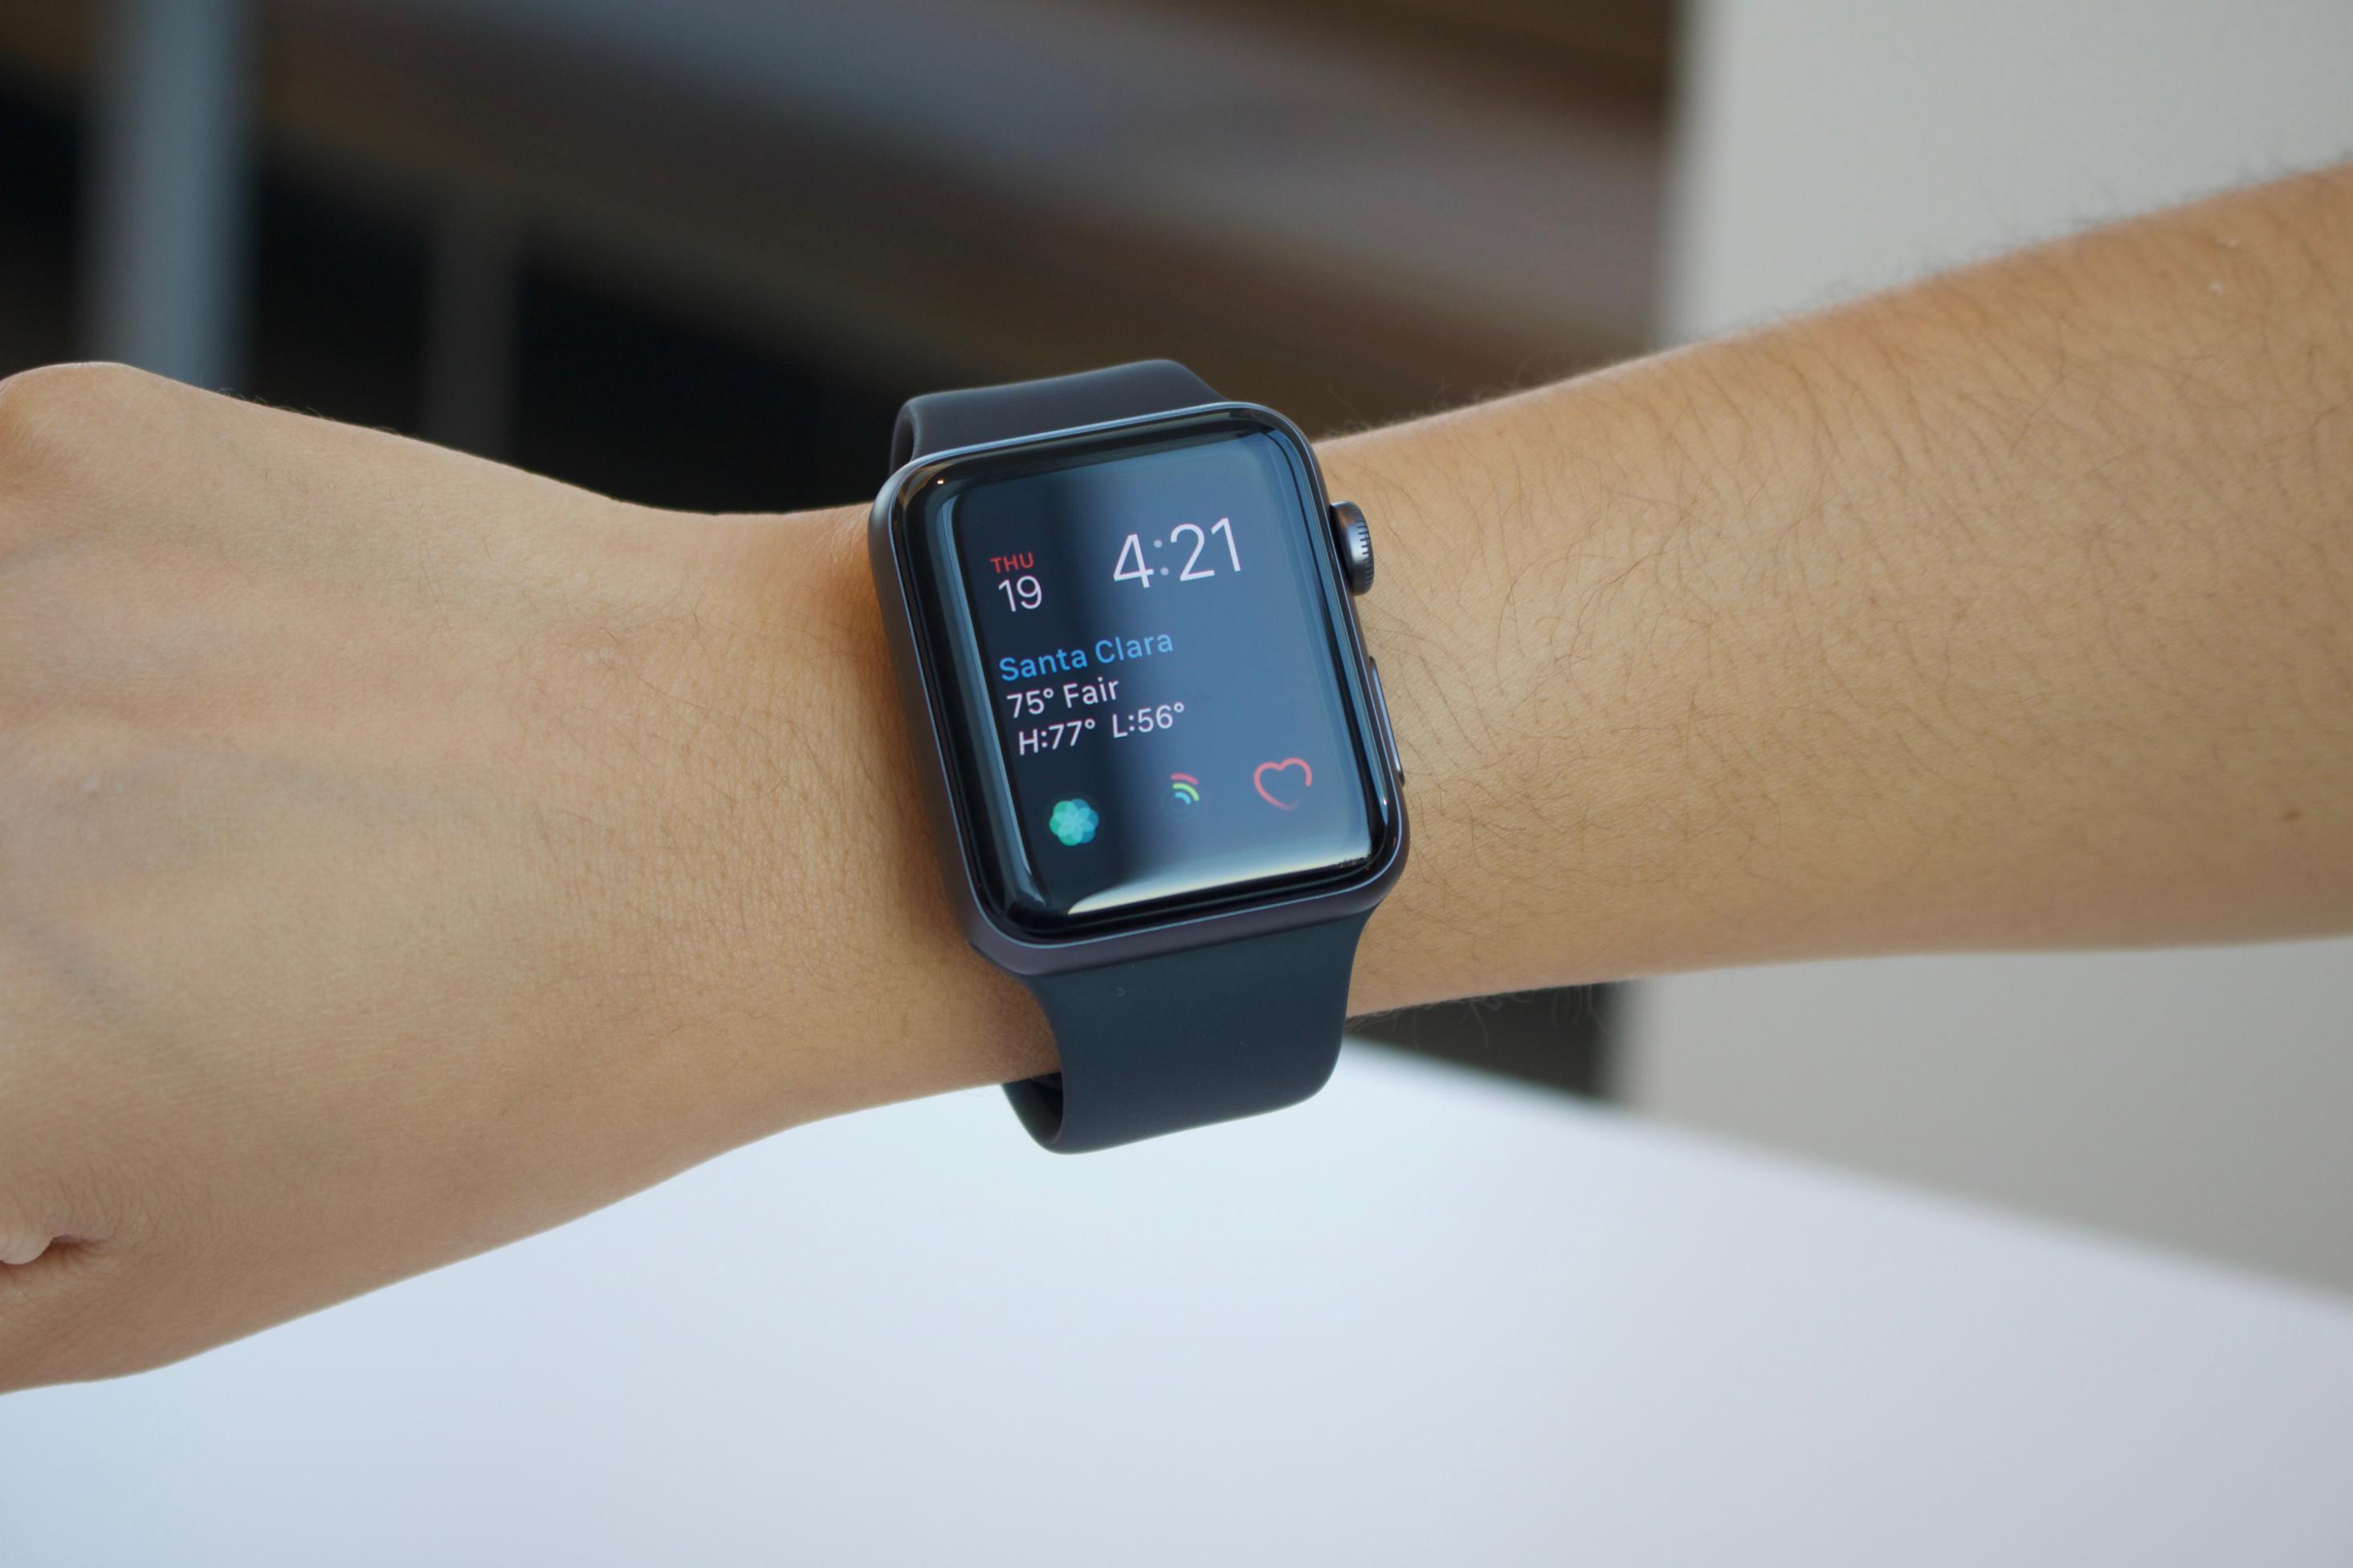 Línea de visión ayer hermosa  Apple Watch Series 3 revisited: $199 in 2019 puts you into the Apple Watch  ecosystem | CNN Underscored